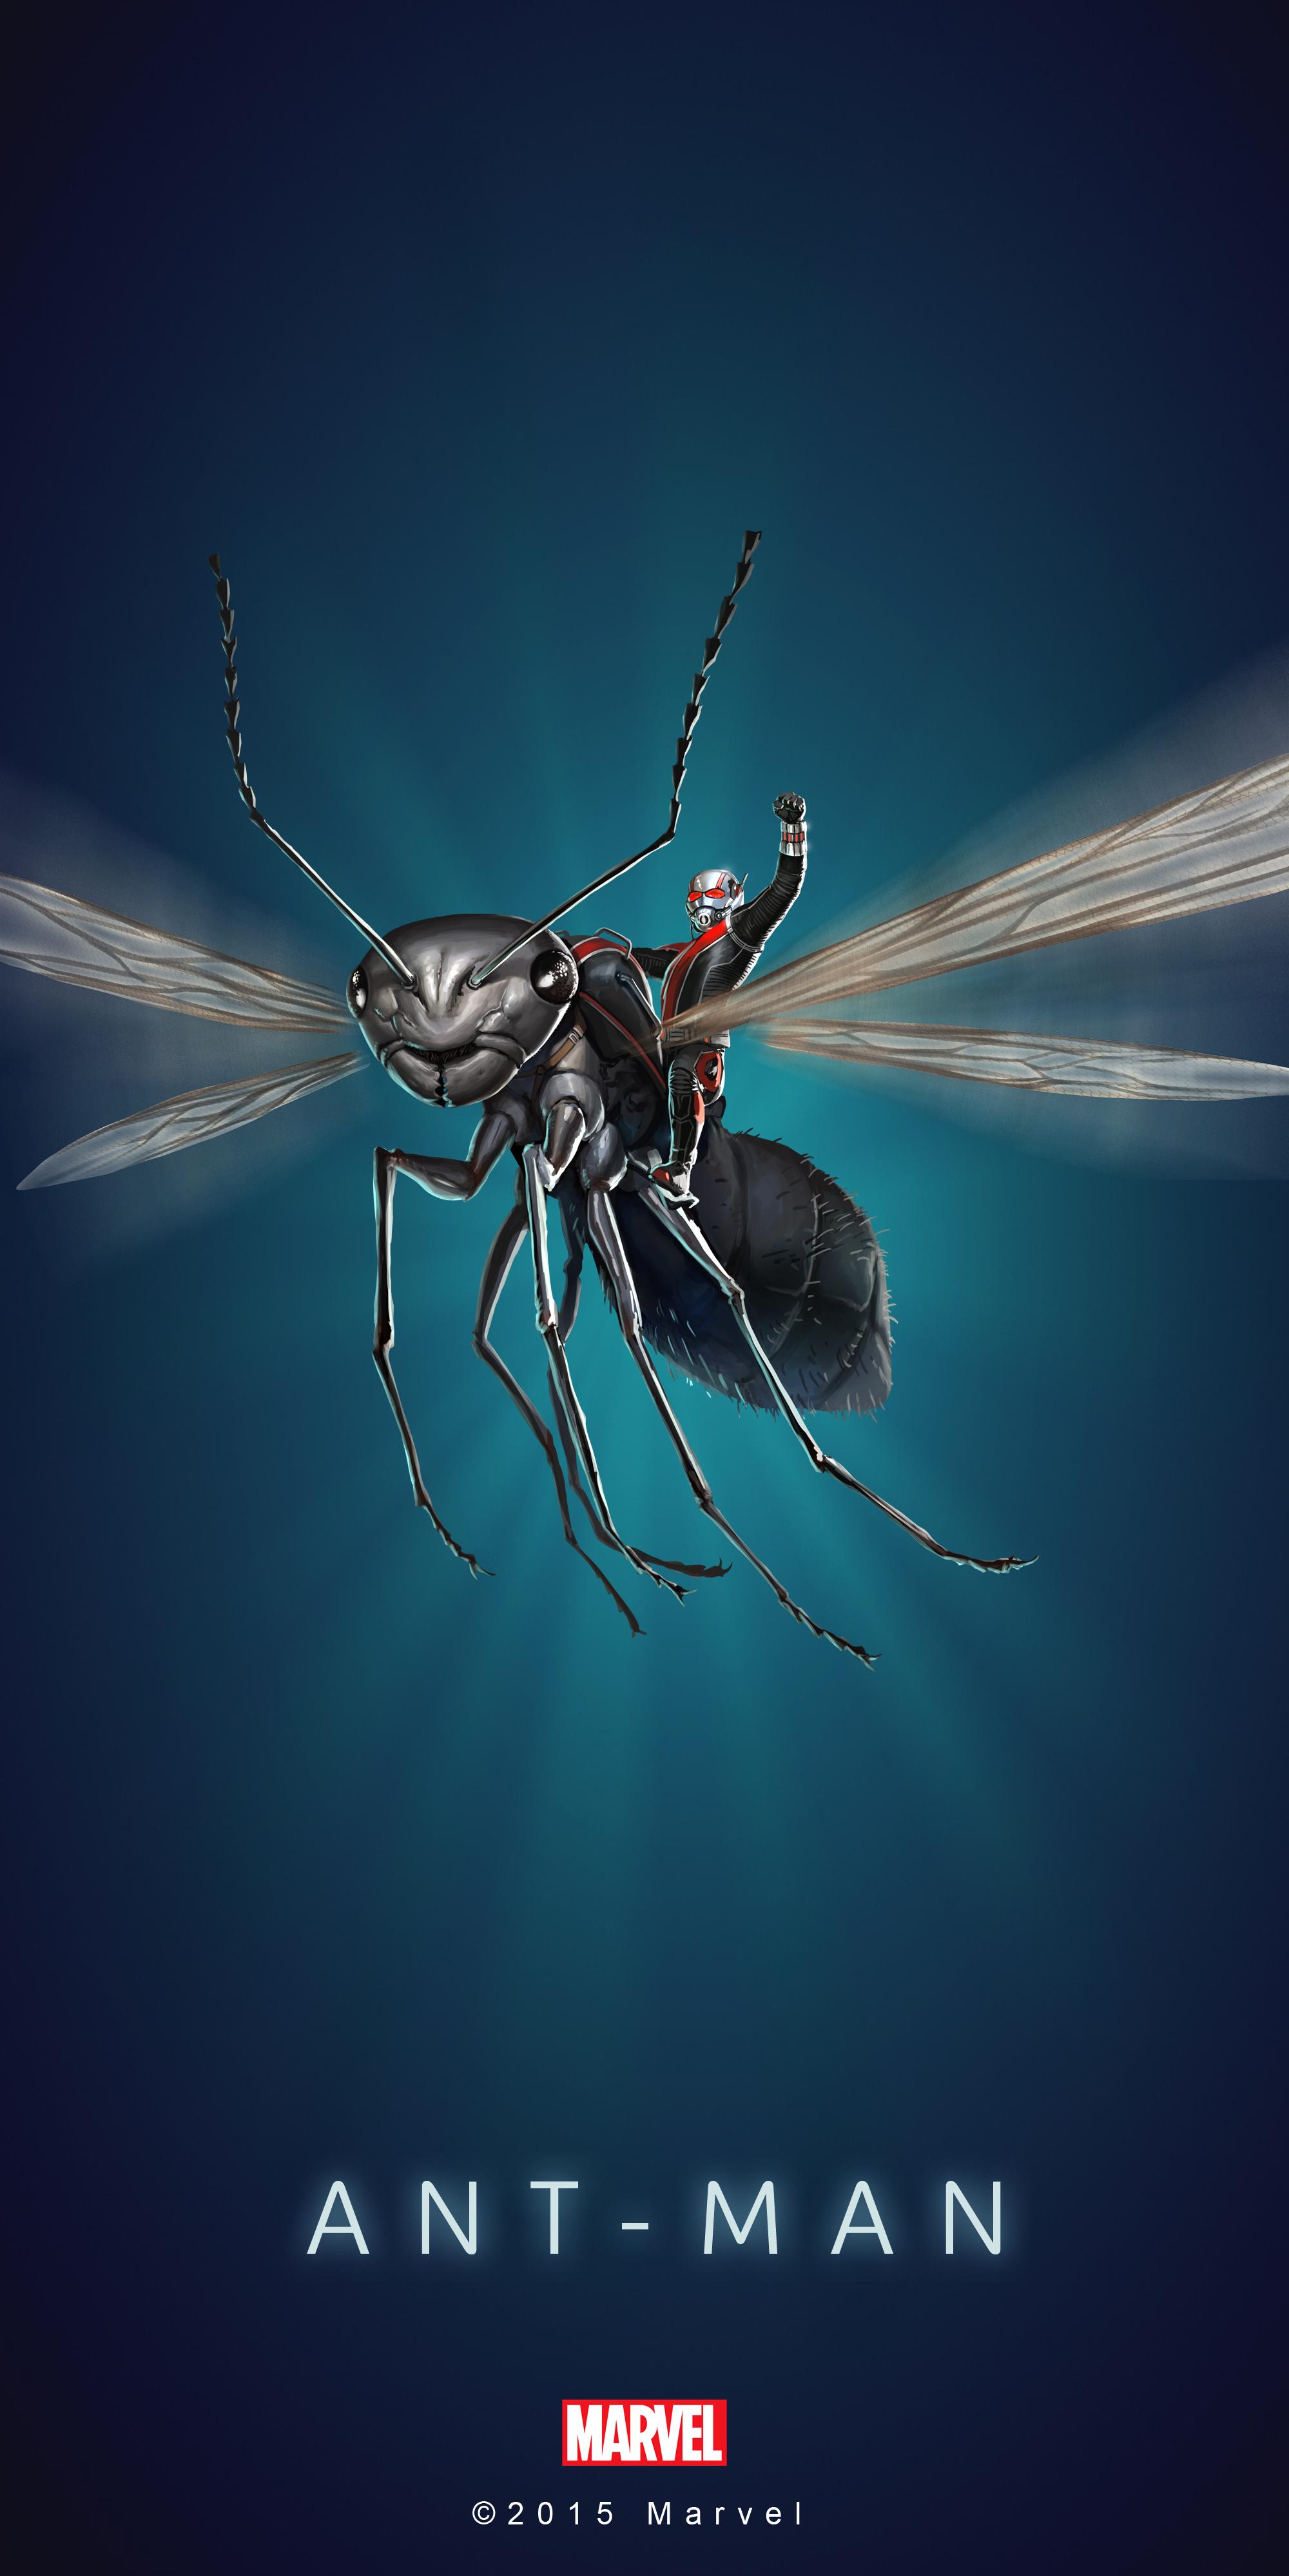 Ant Man Wallpaper 03 DOWNLOAD A HI RES VERSION HERE 2000x3997